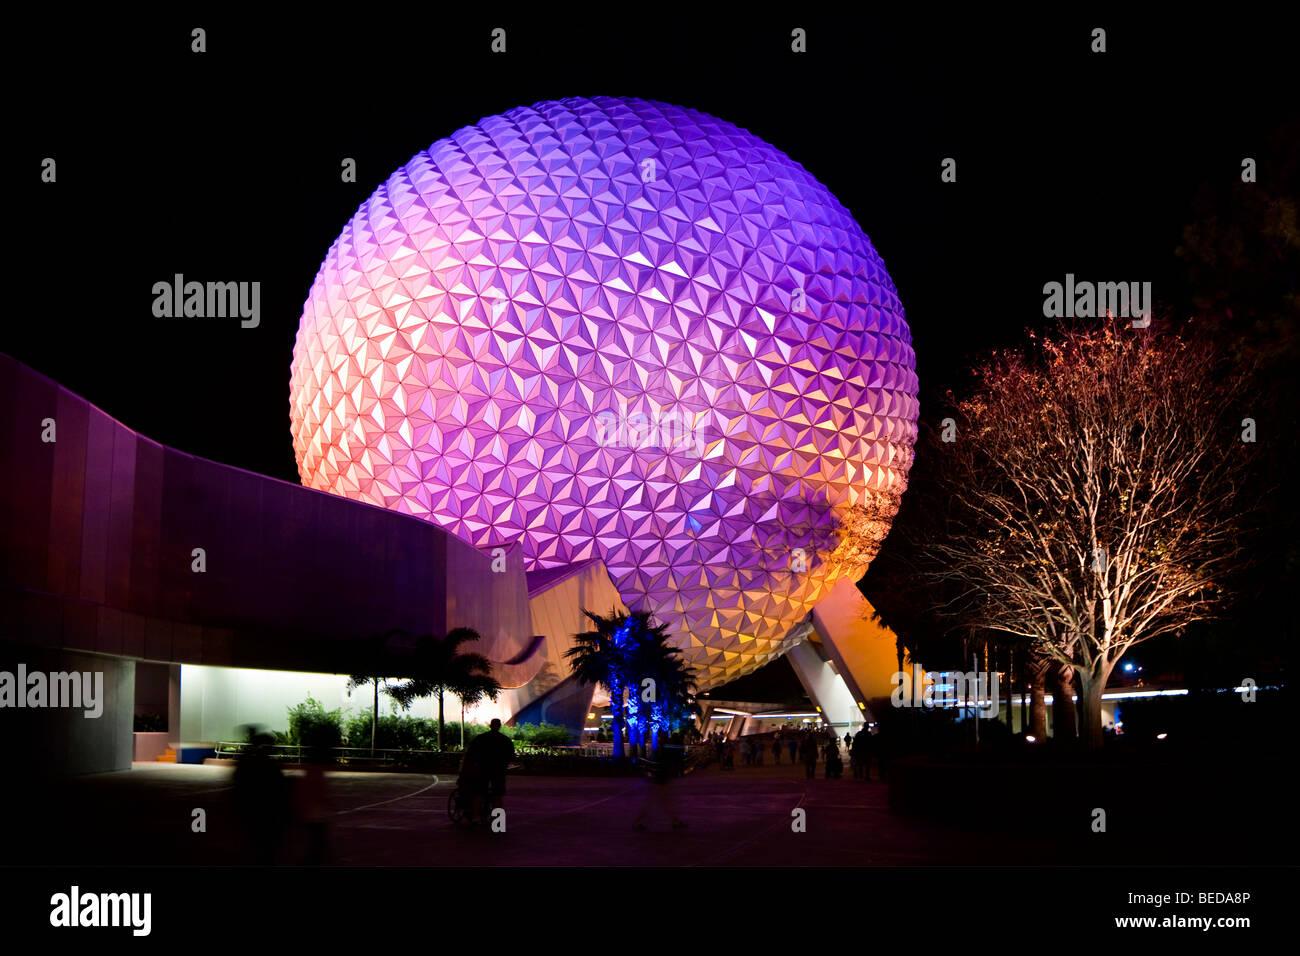 Spaceship Earth's geodesic sphere at night at Walt Disney World, Florida, USA - Stock Image